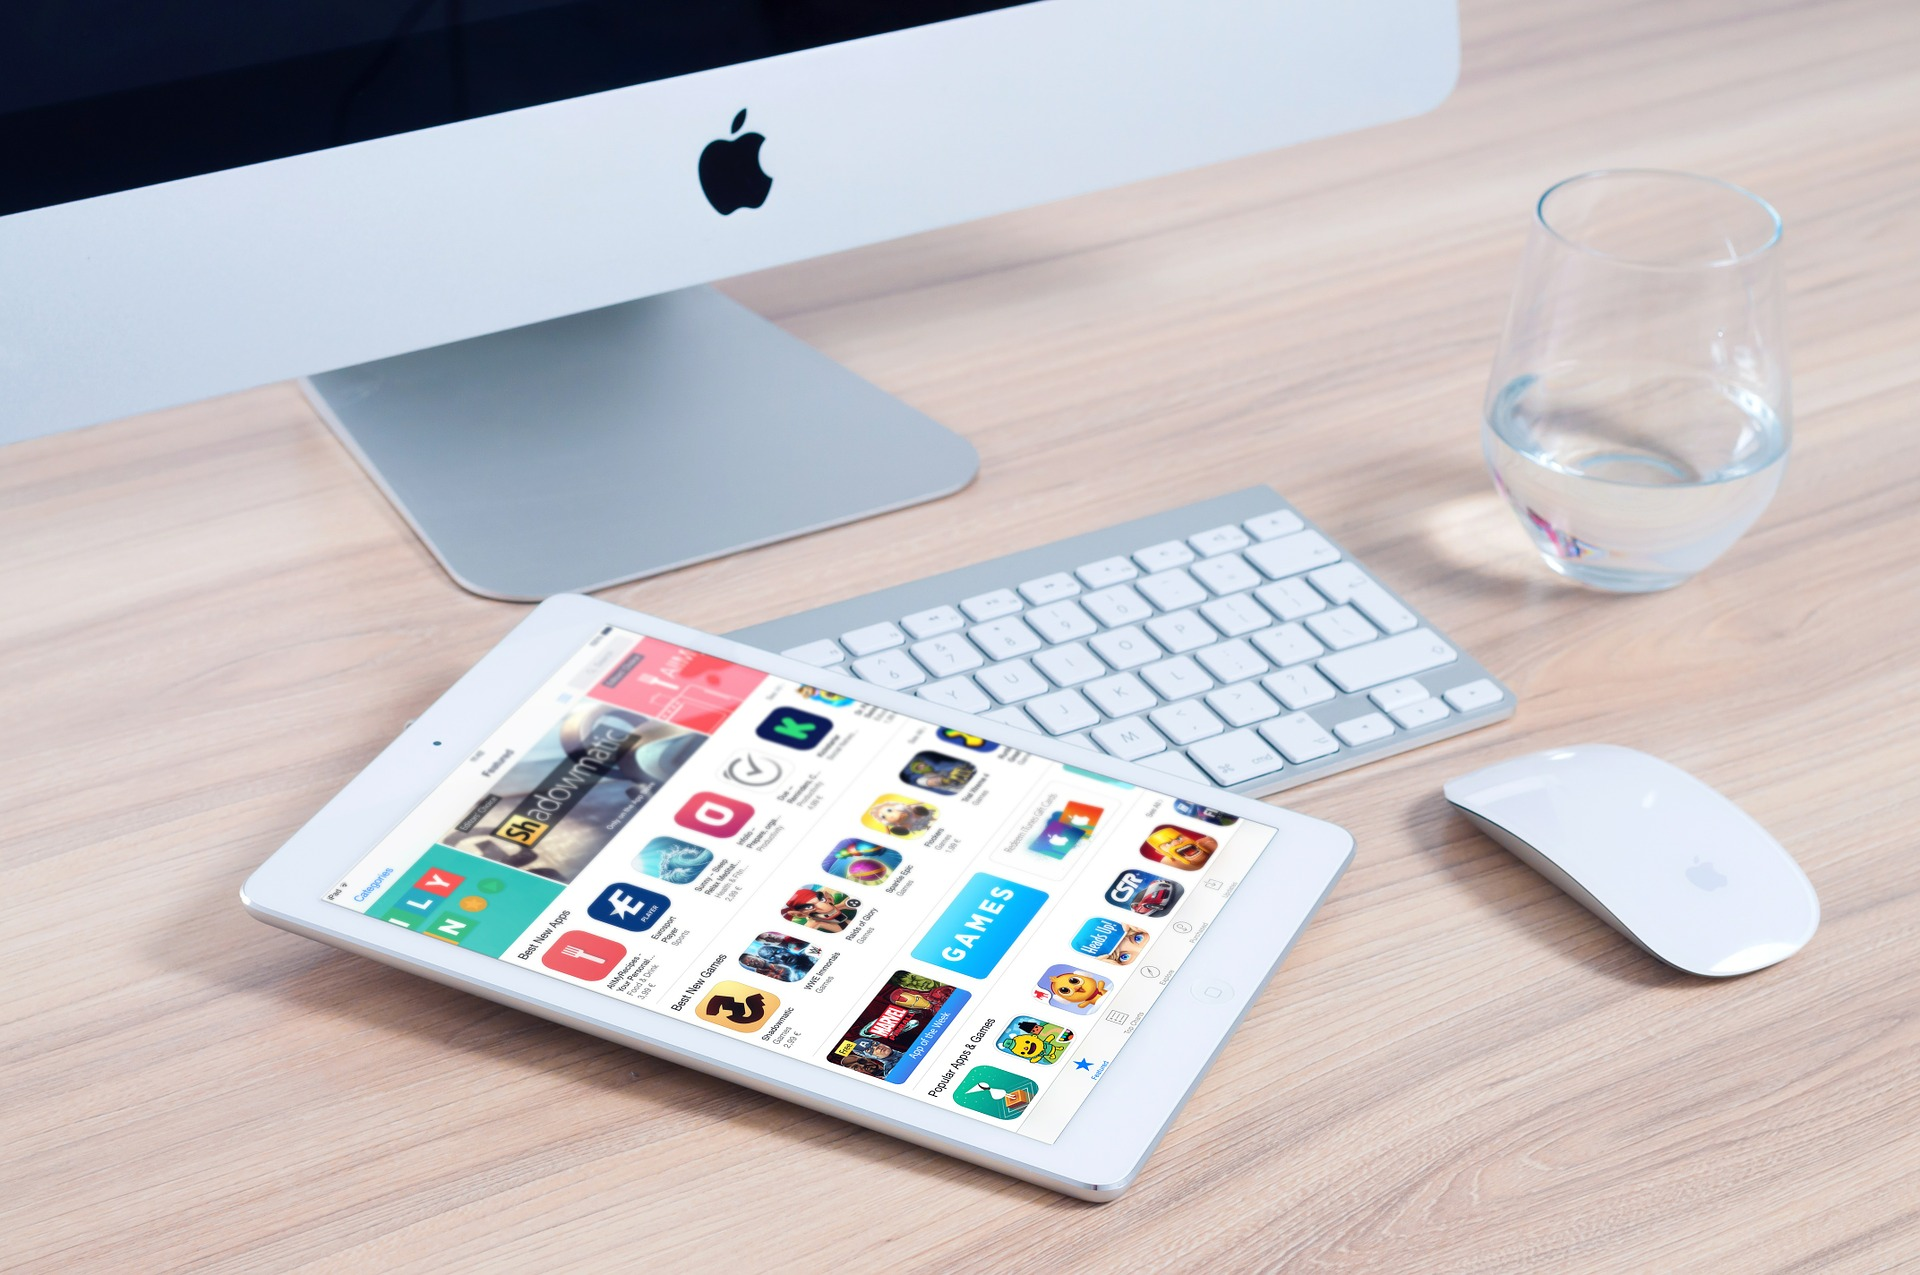 iMac & iPad